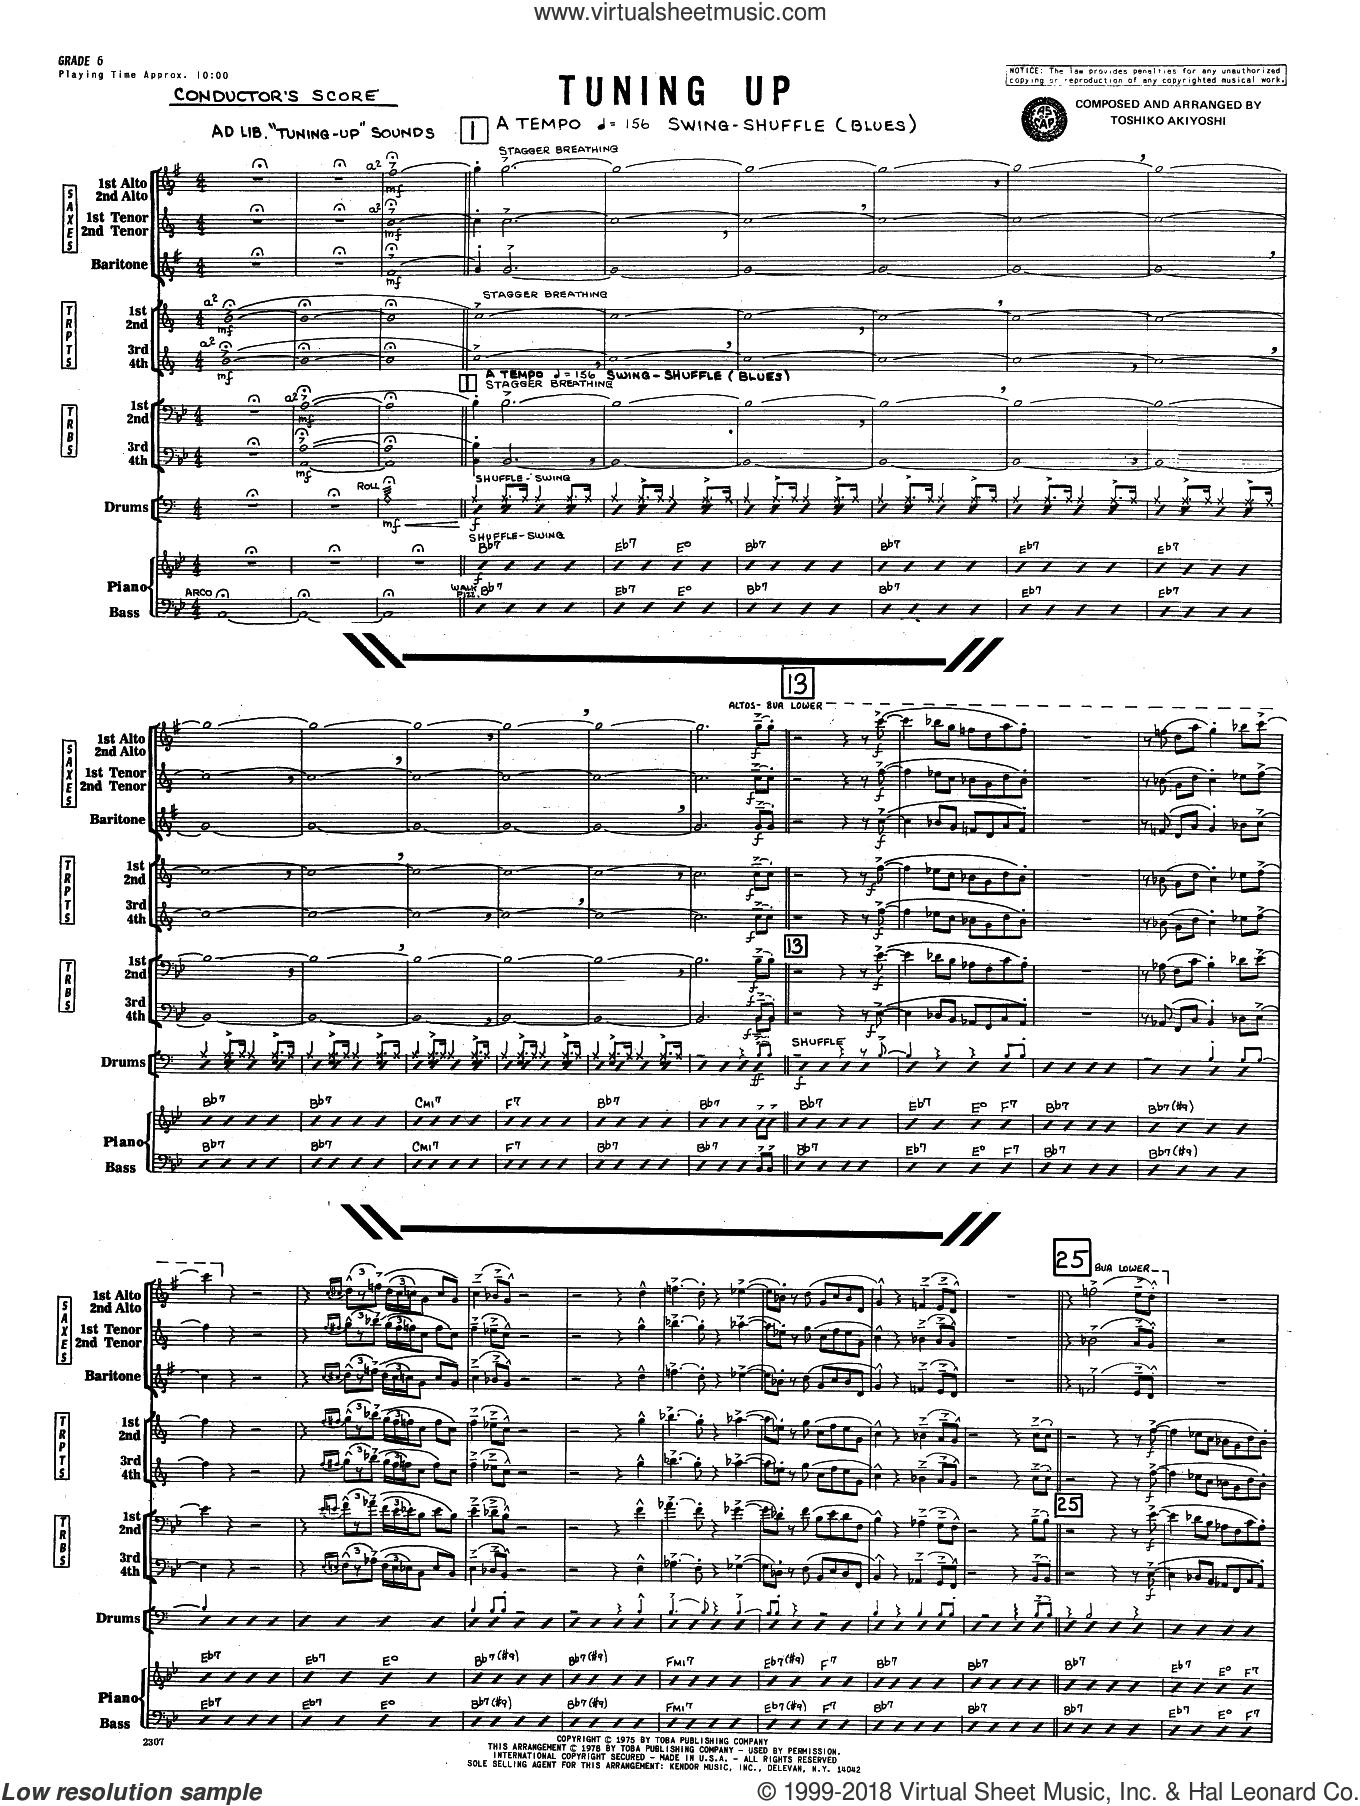 Tuning Up (COMPLETE) sheet music for jazz band by Toshiko Akiyoshi, intermediate skill level